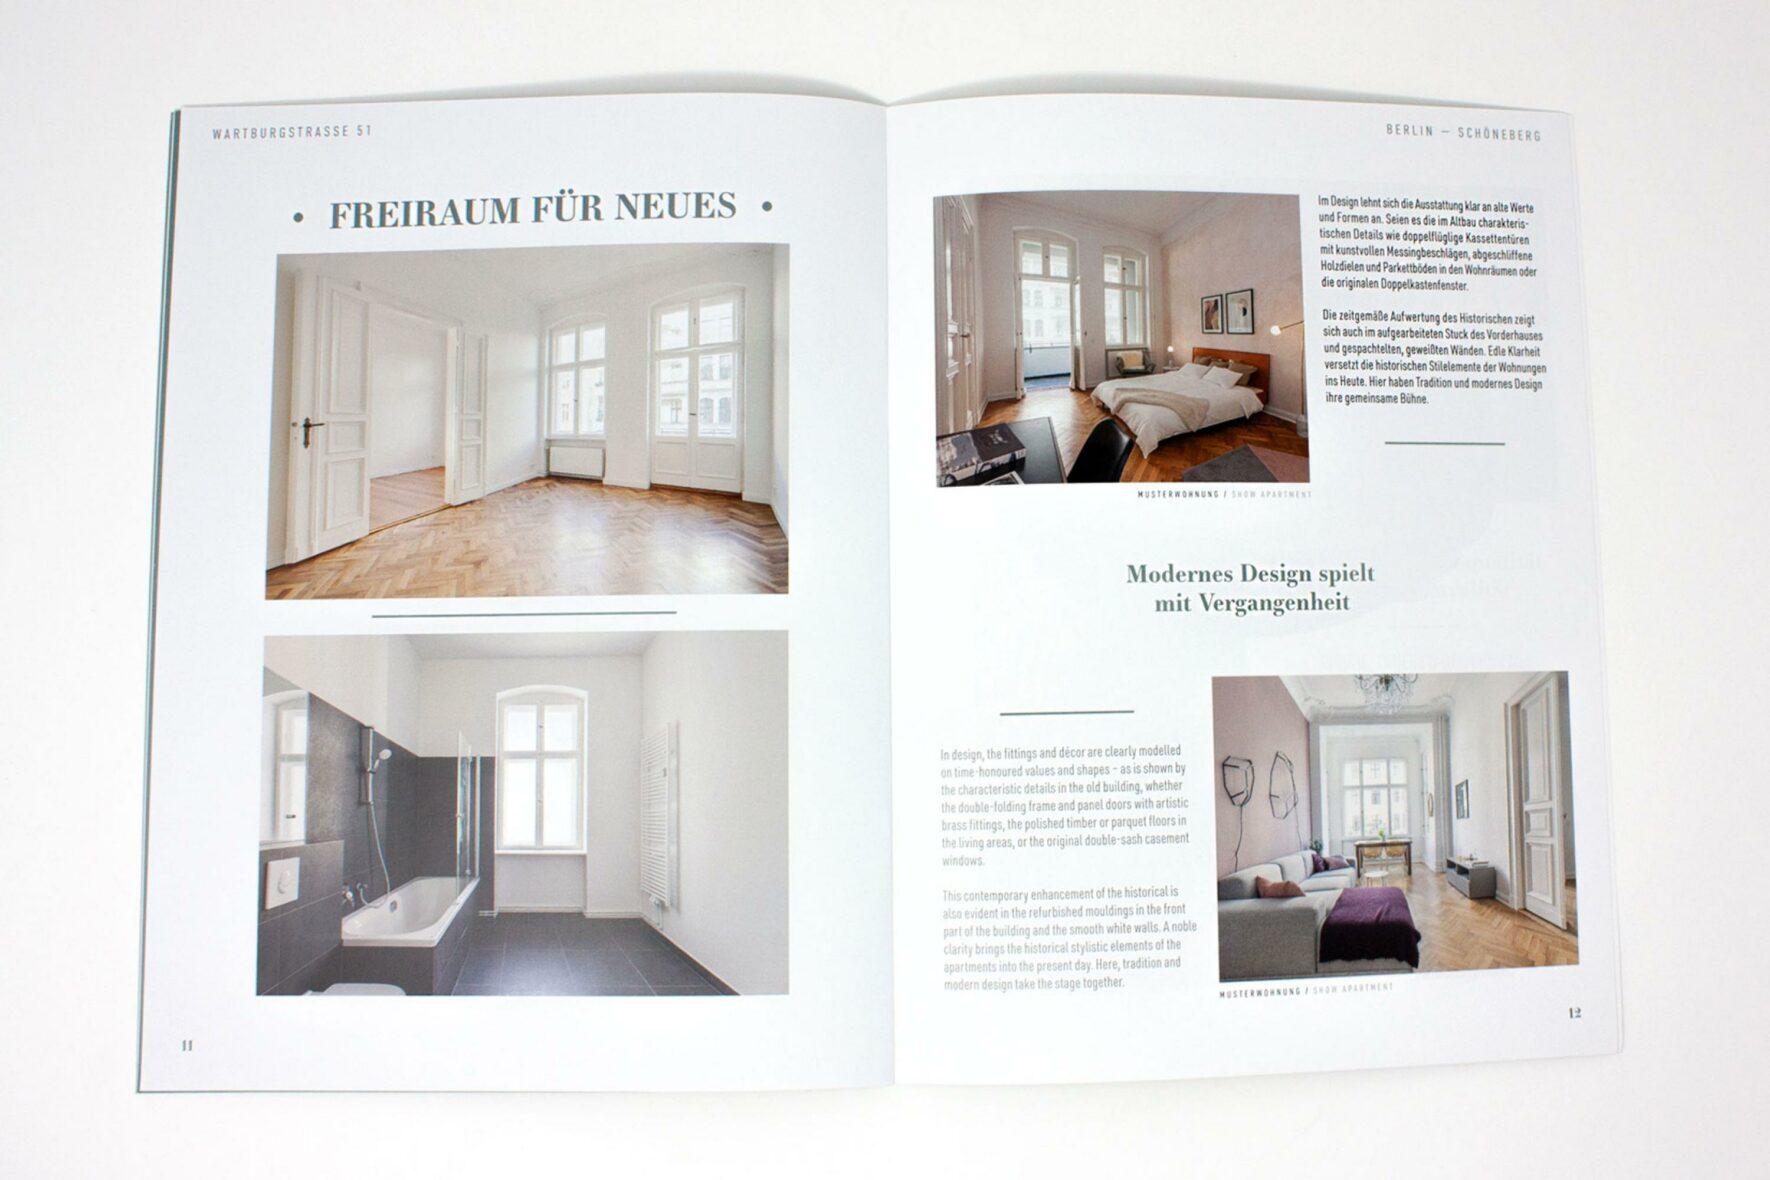 Immobilienbranding-wartburg-Trendcity-Broschüre-FORMLOS-berlin_MG_8298